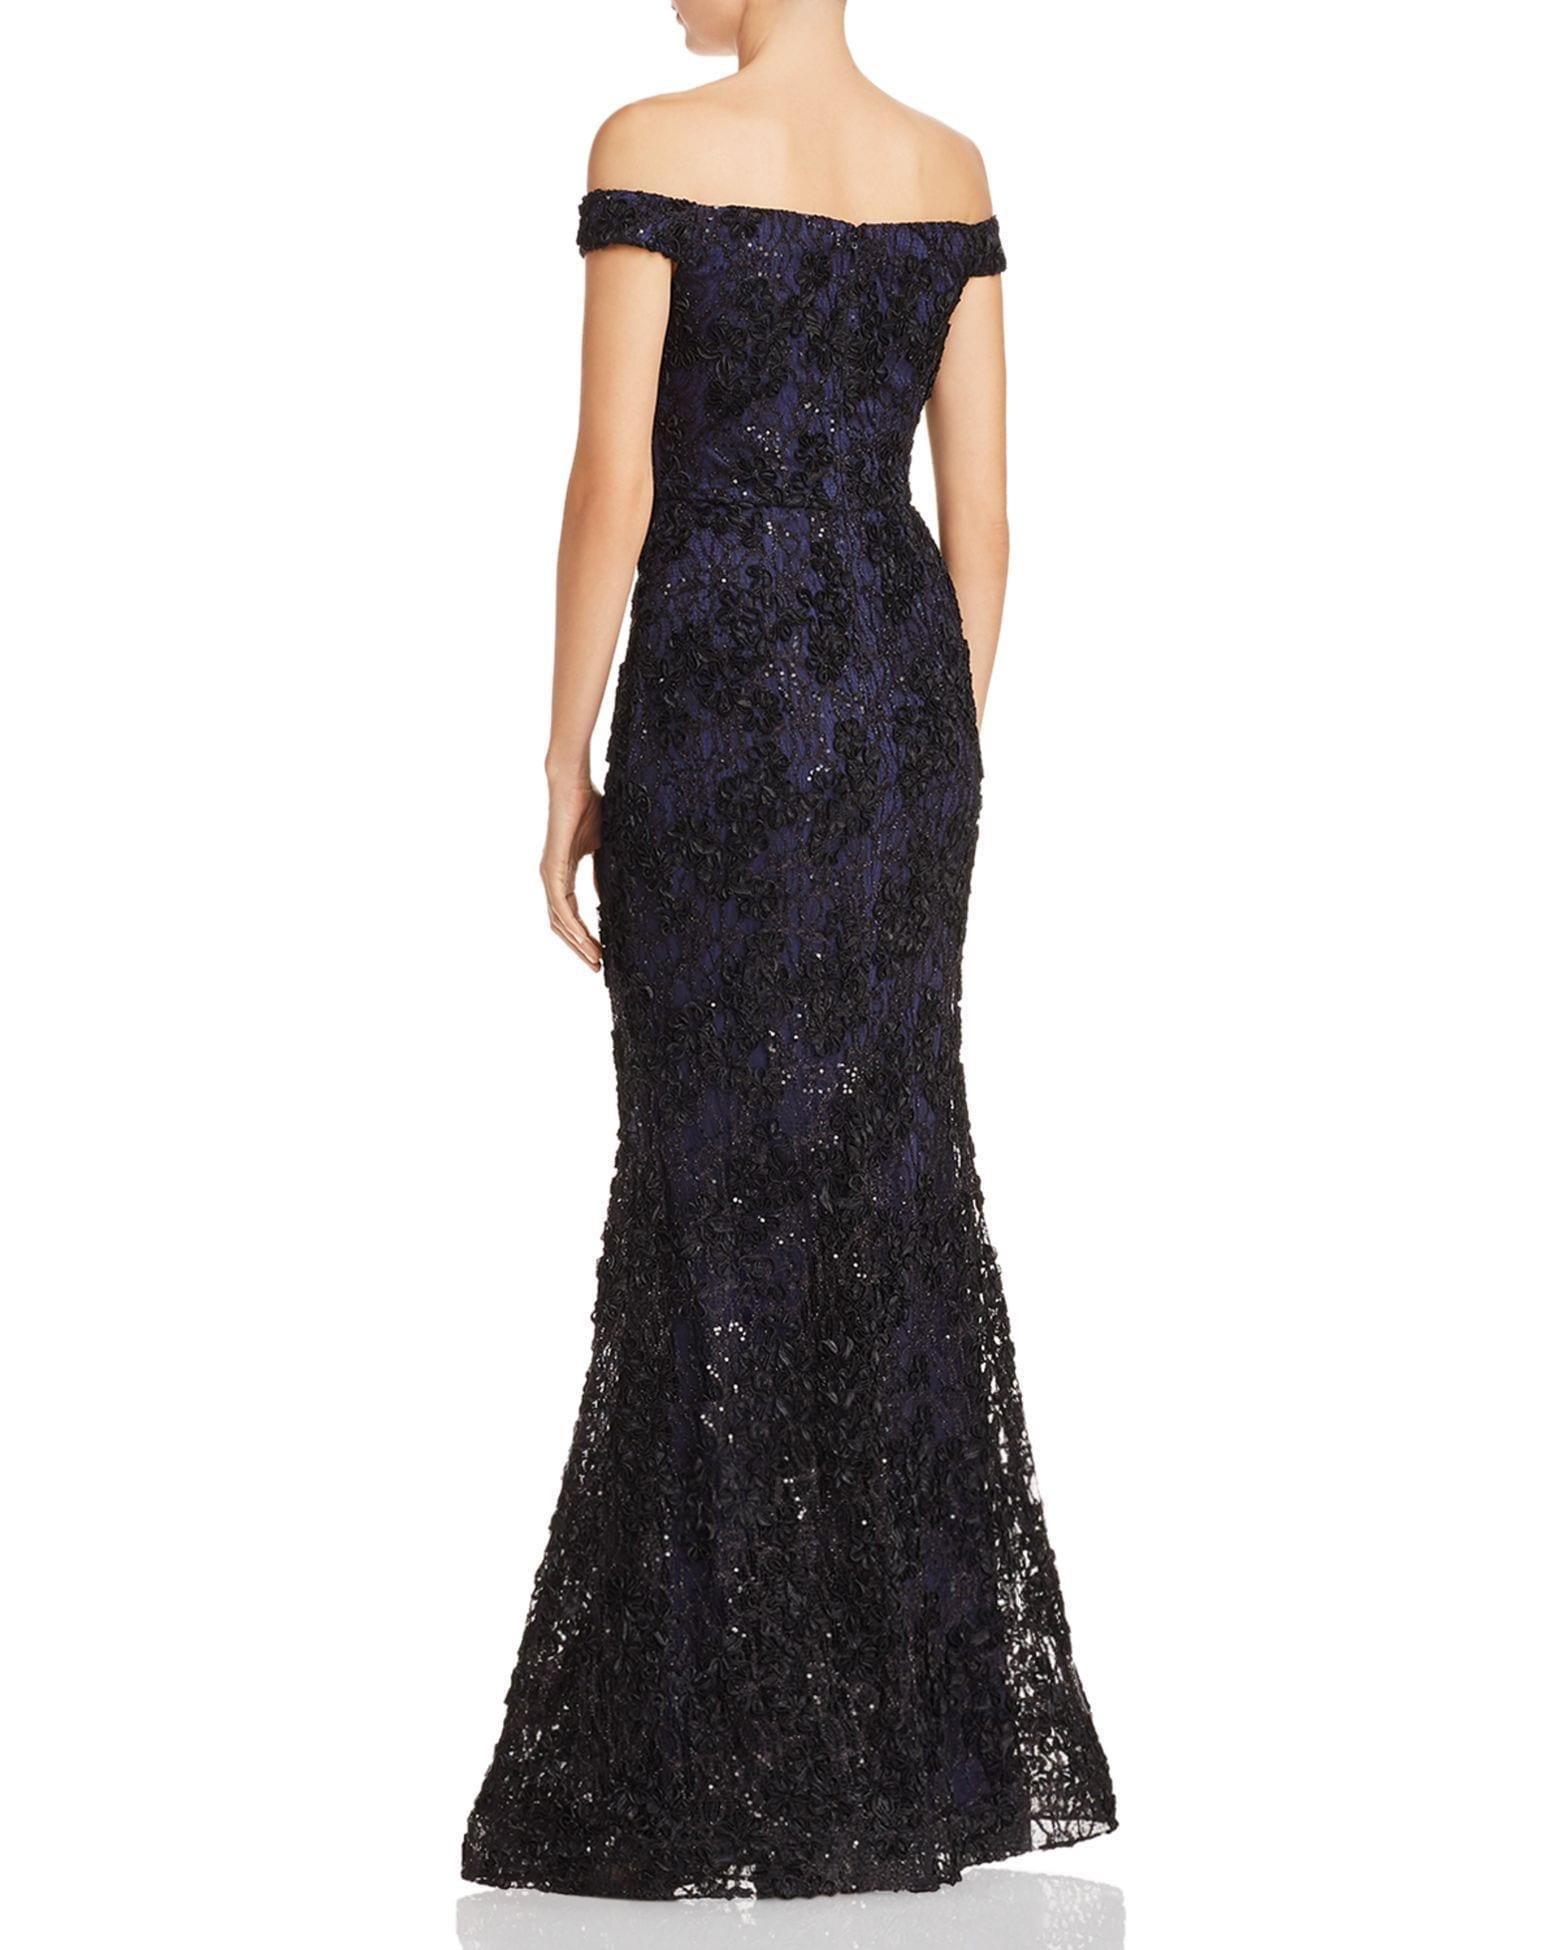 AQUA Off-the-Shoulder Embellished Lace Gown